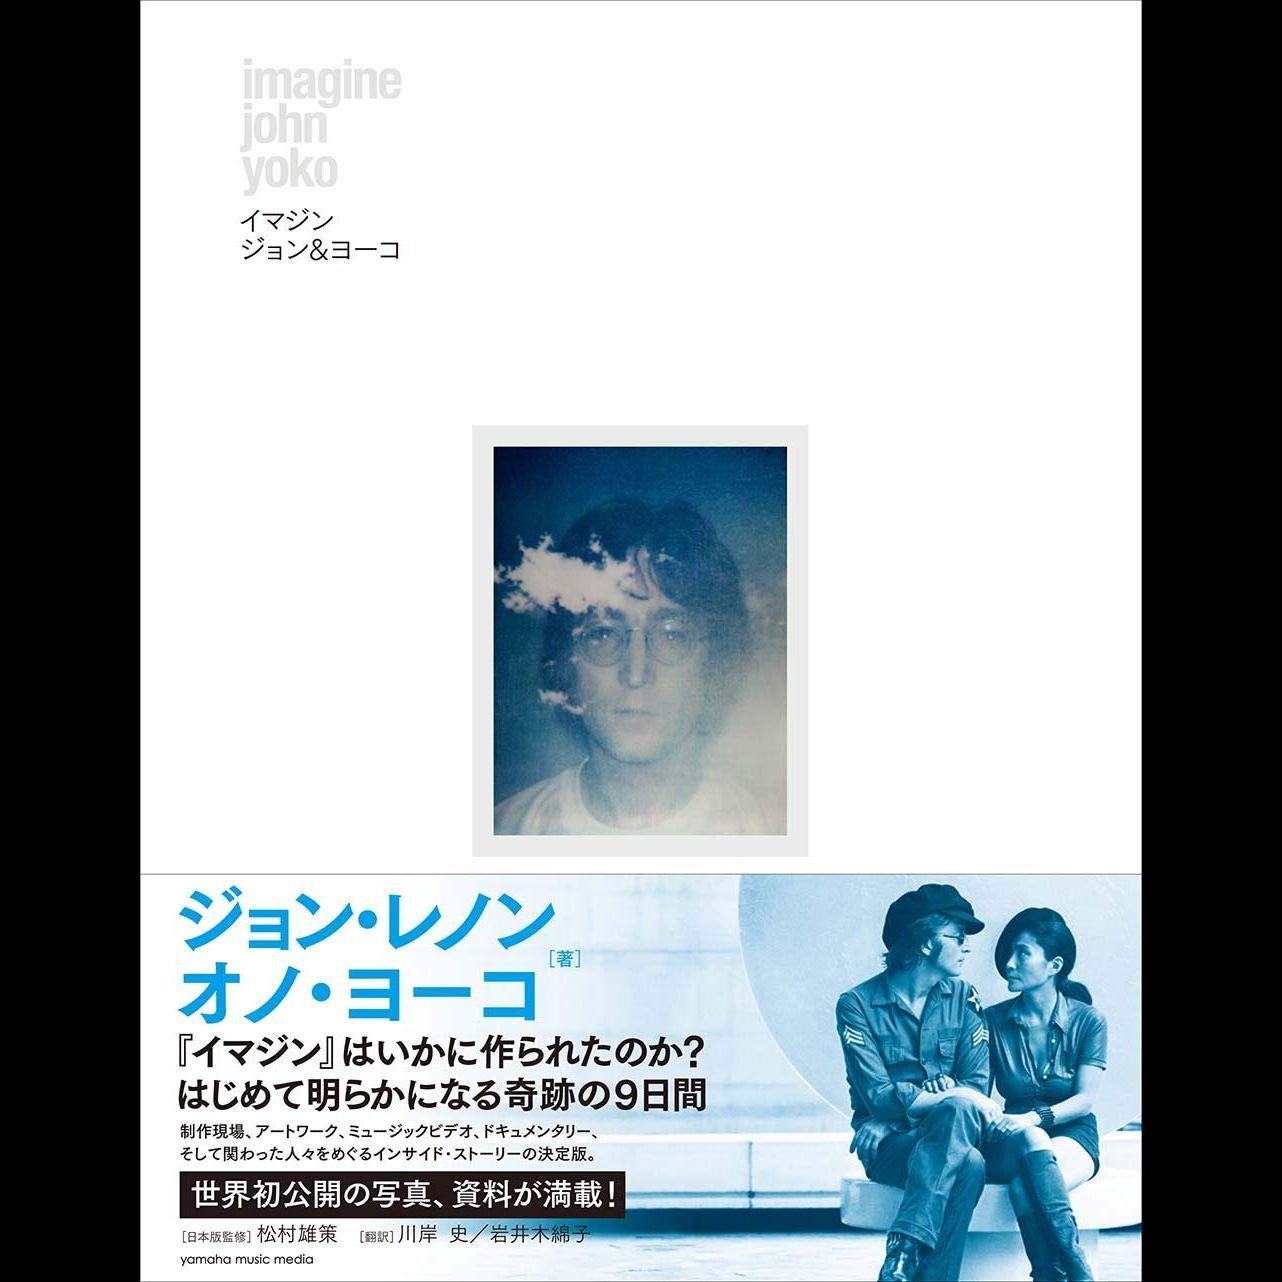 JOHN LENNON & YOKO ONO / ジョン・レノン&ヨーコ・オノ / イマジン:ジョン&ヨーコ